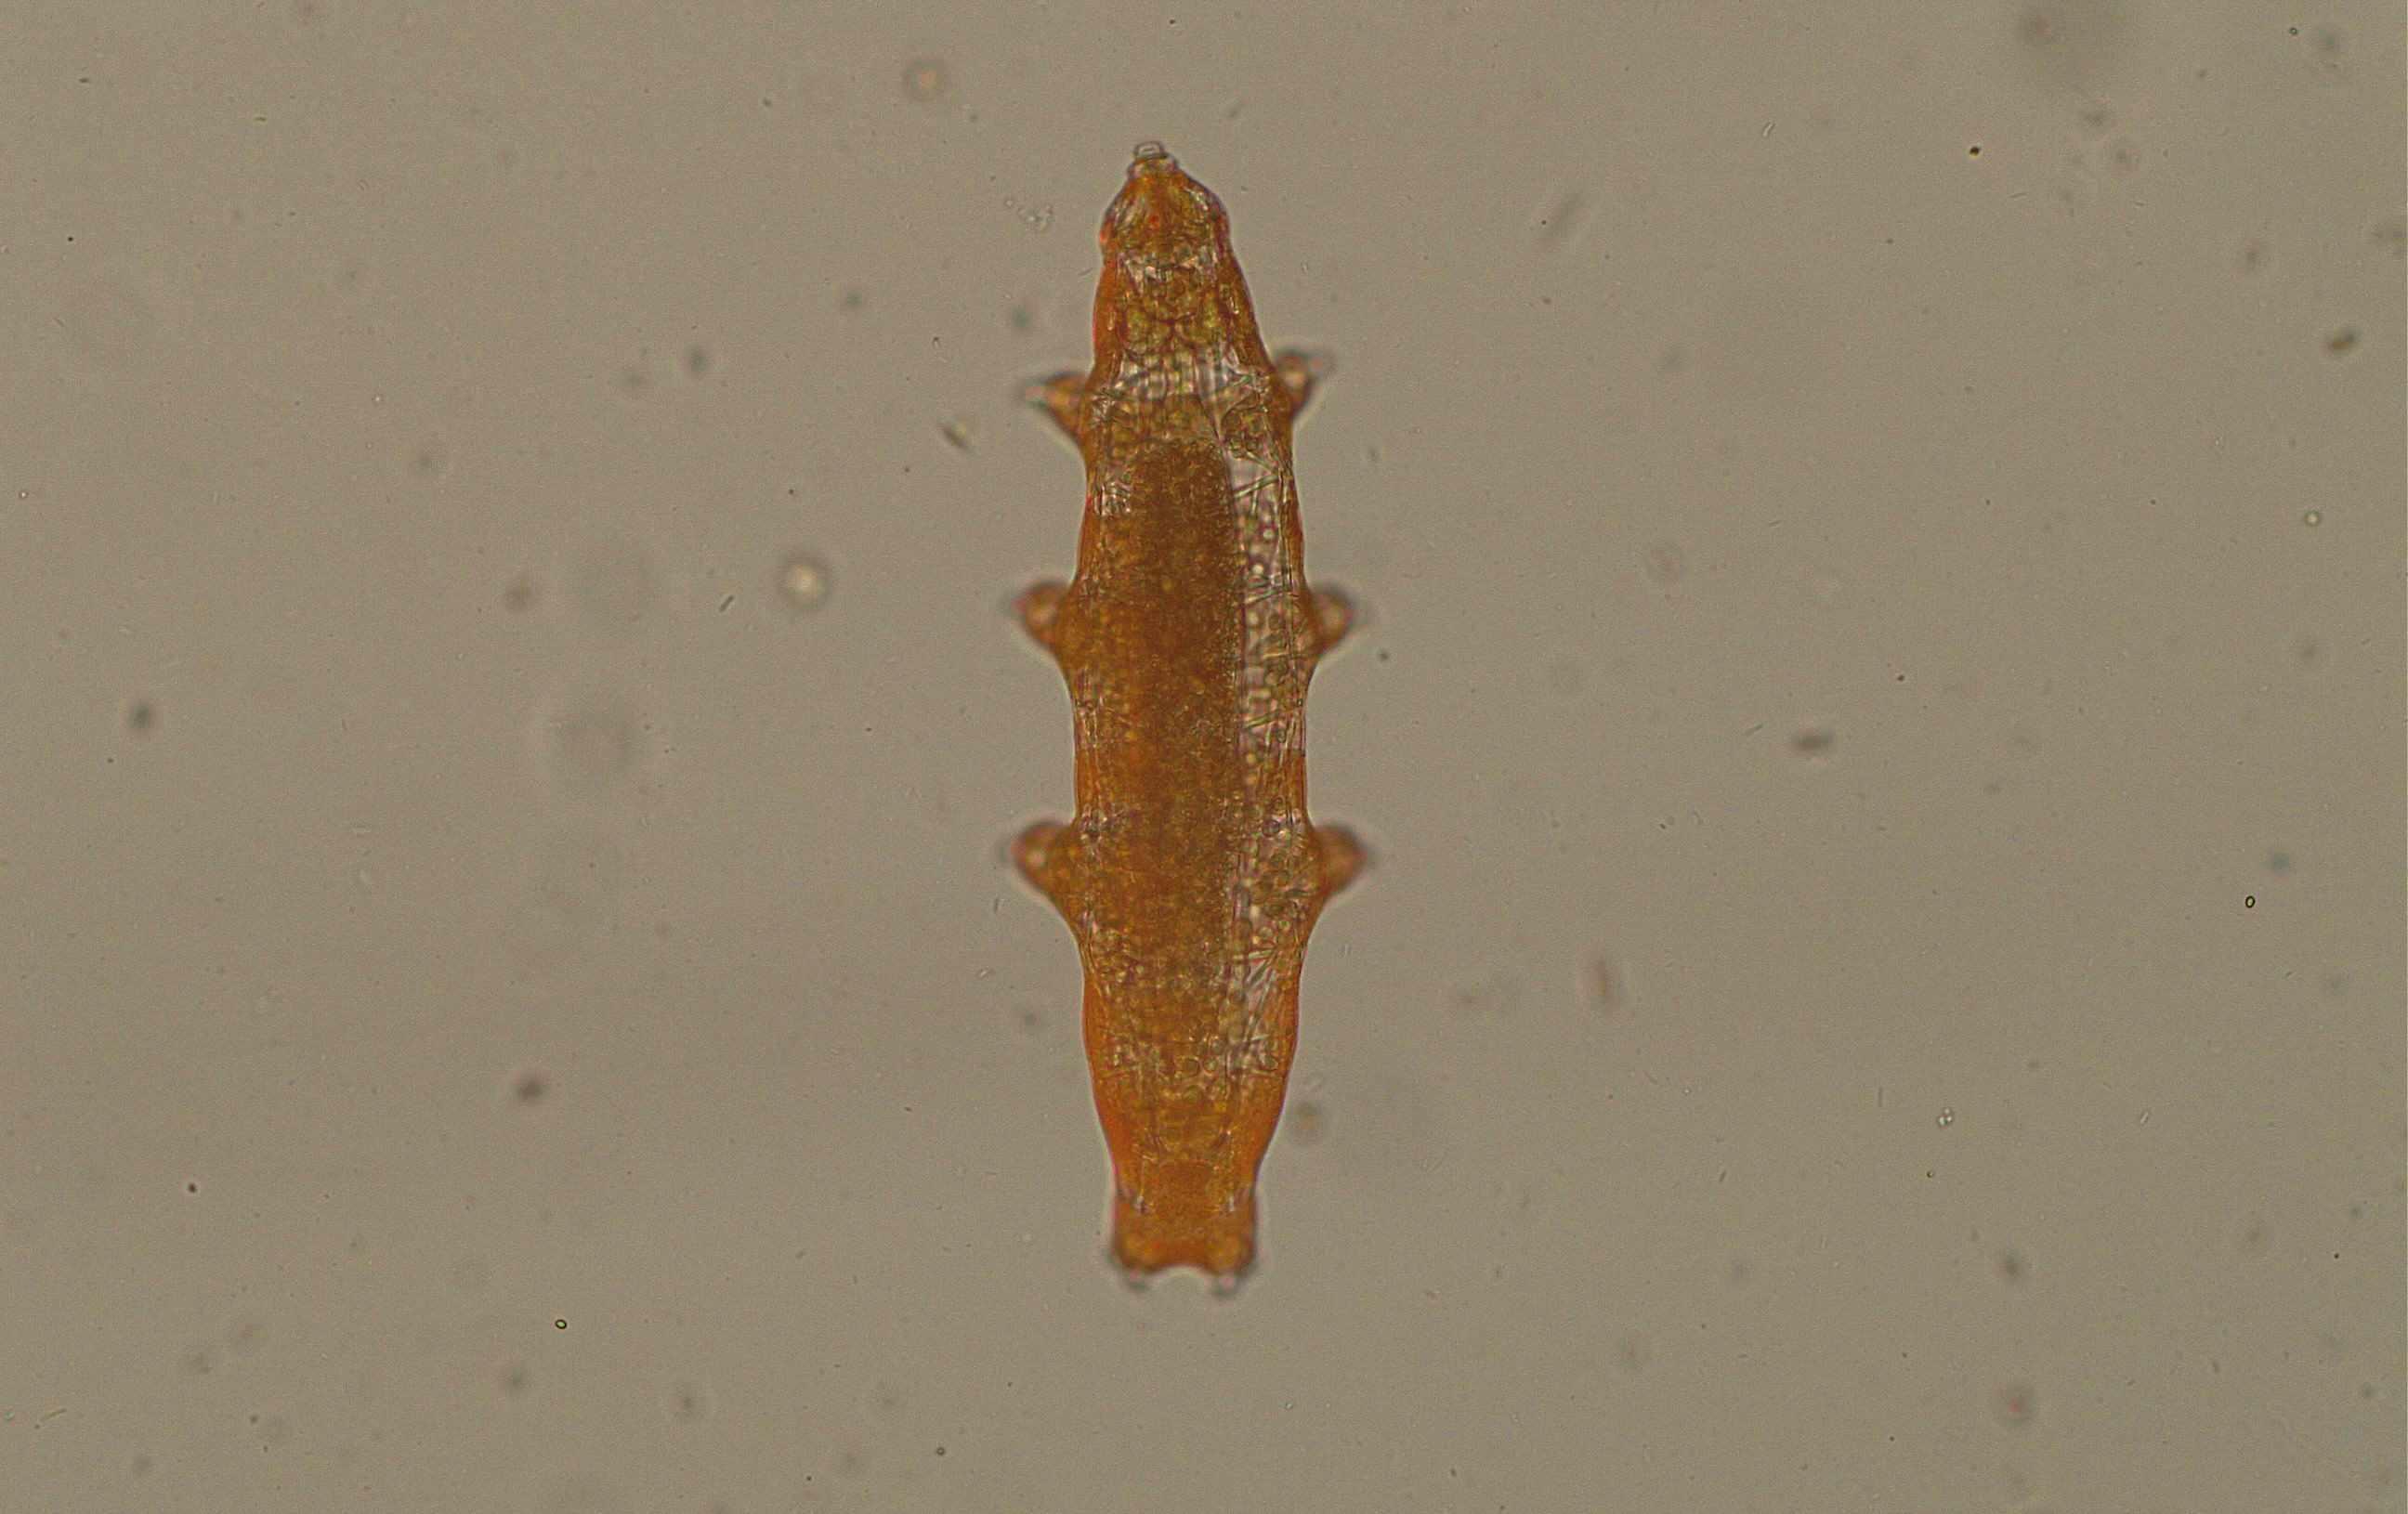 tardigrade magnified 40x under microscope